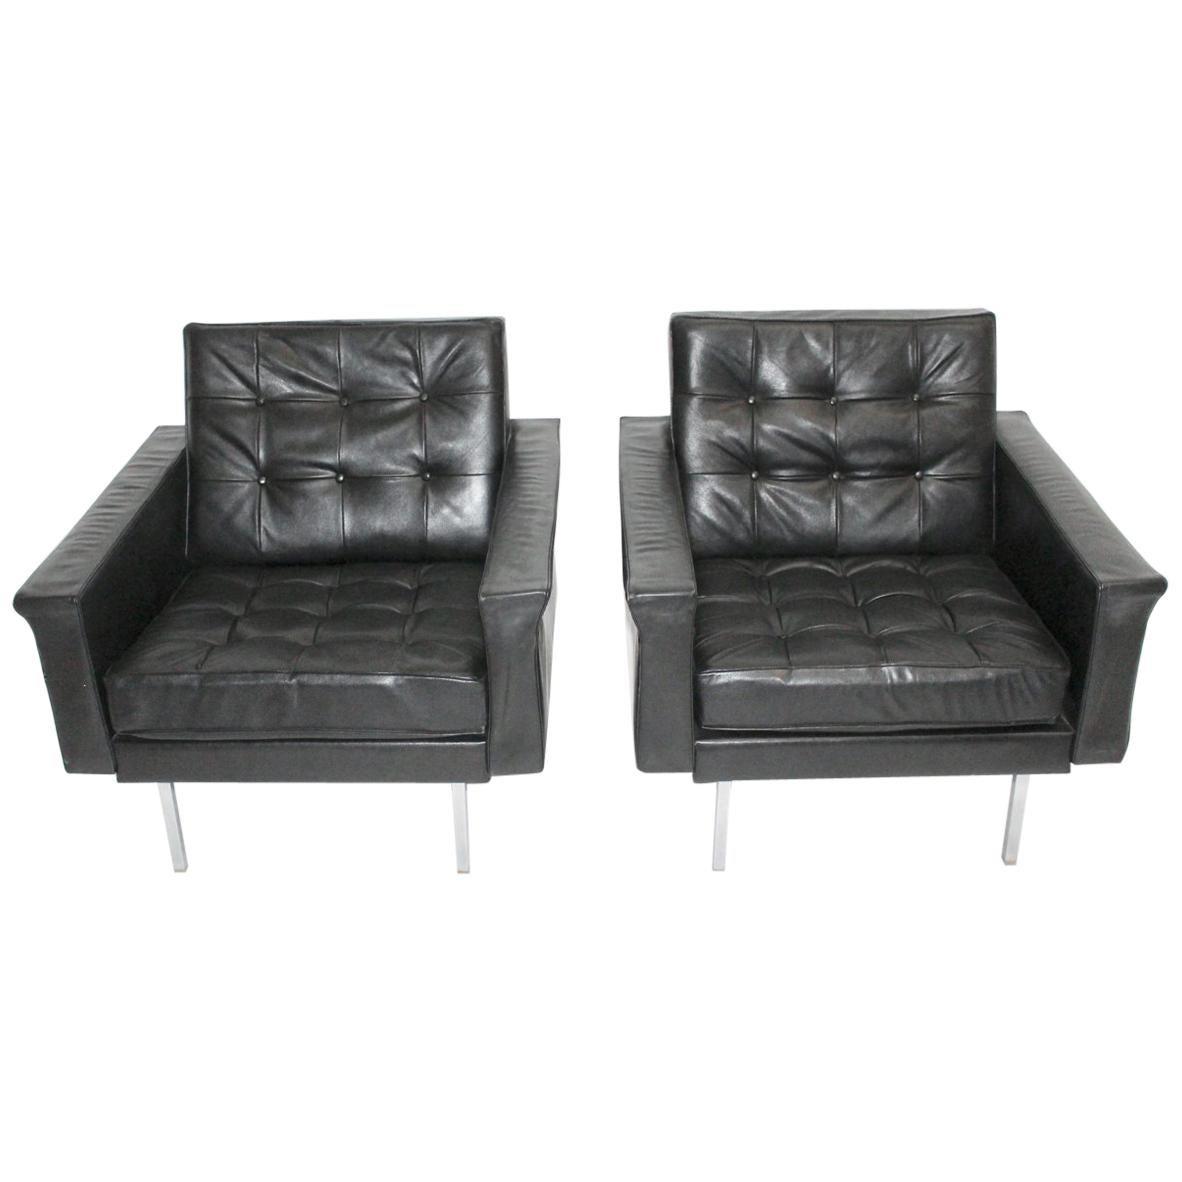 Black Leather Club Chairs by Johannes Spalt, Vienna, 1960 for Franz Wittmann